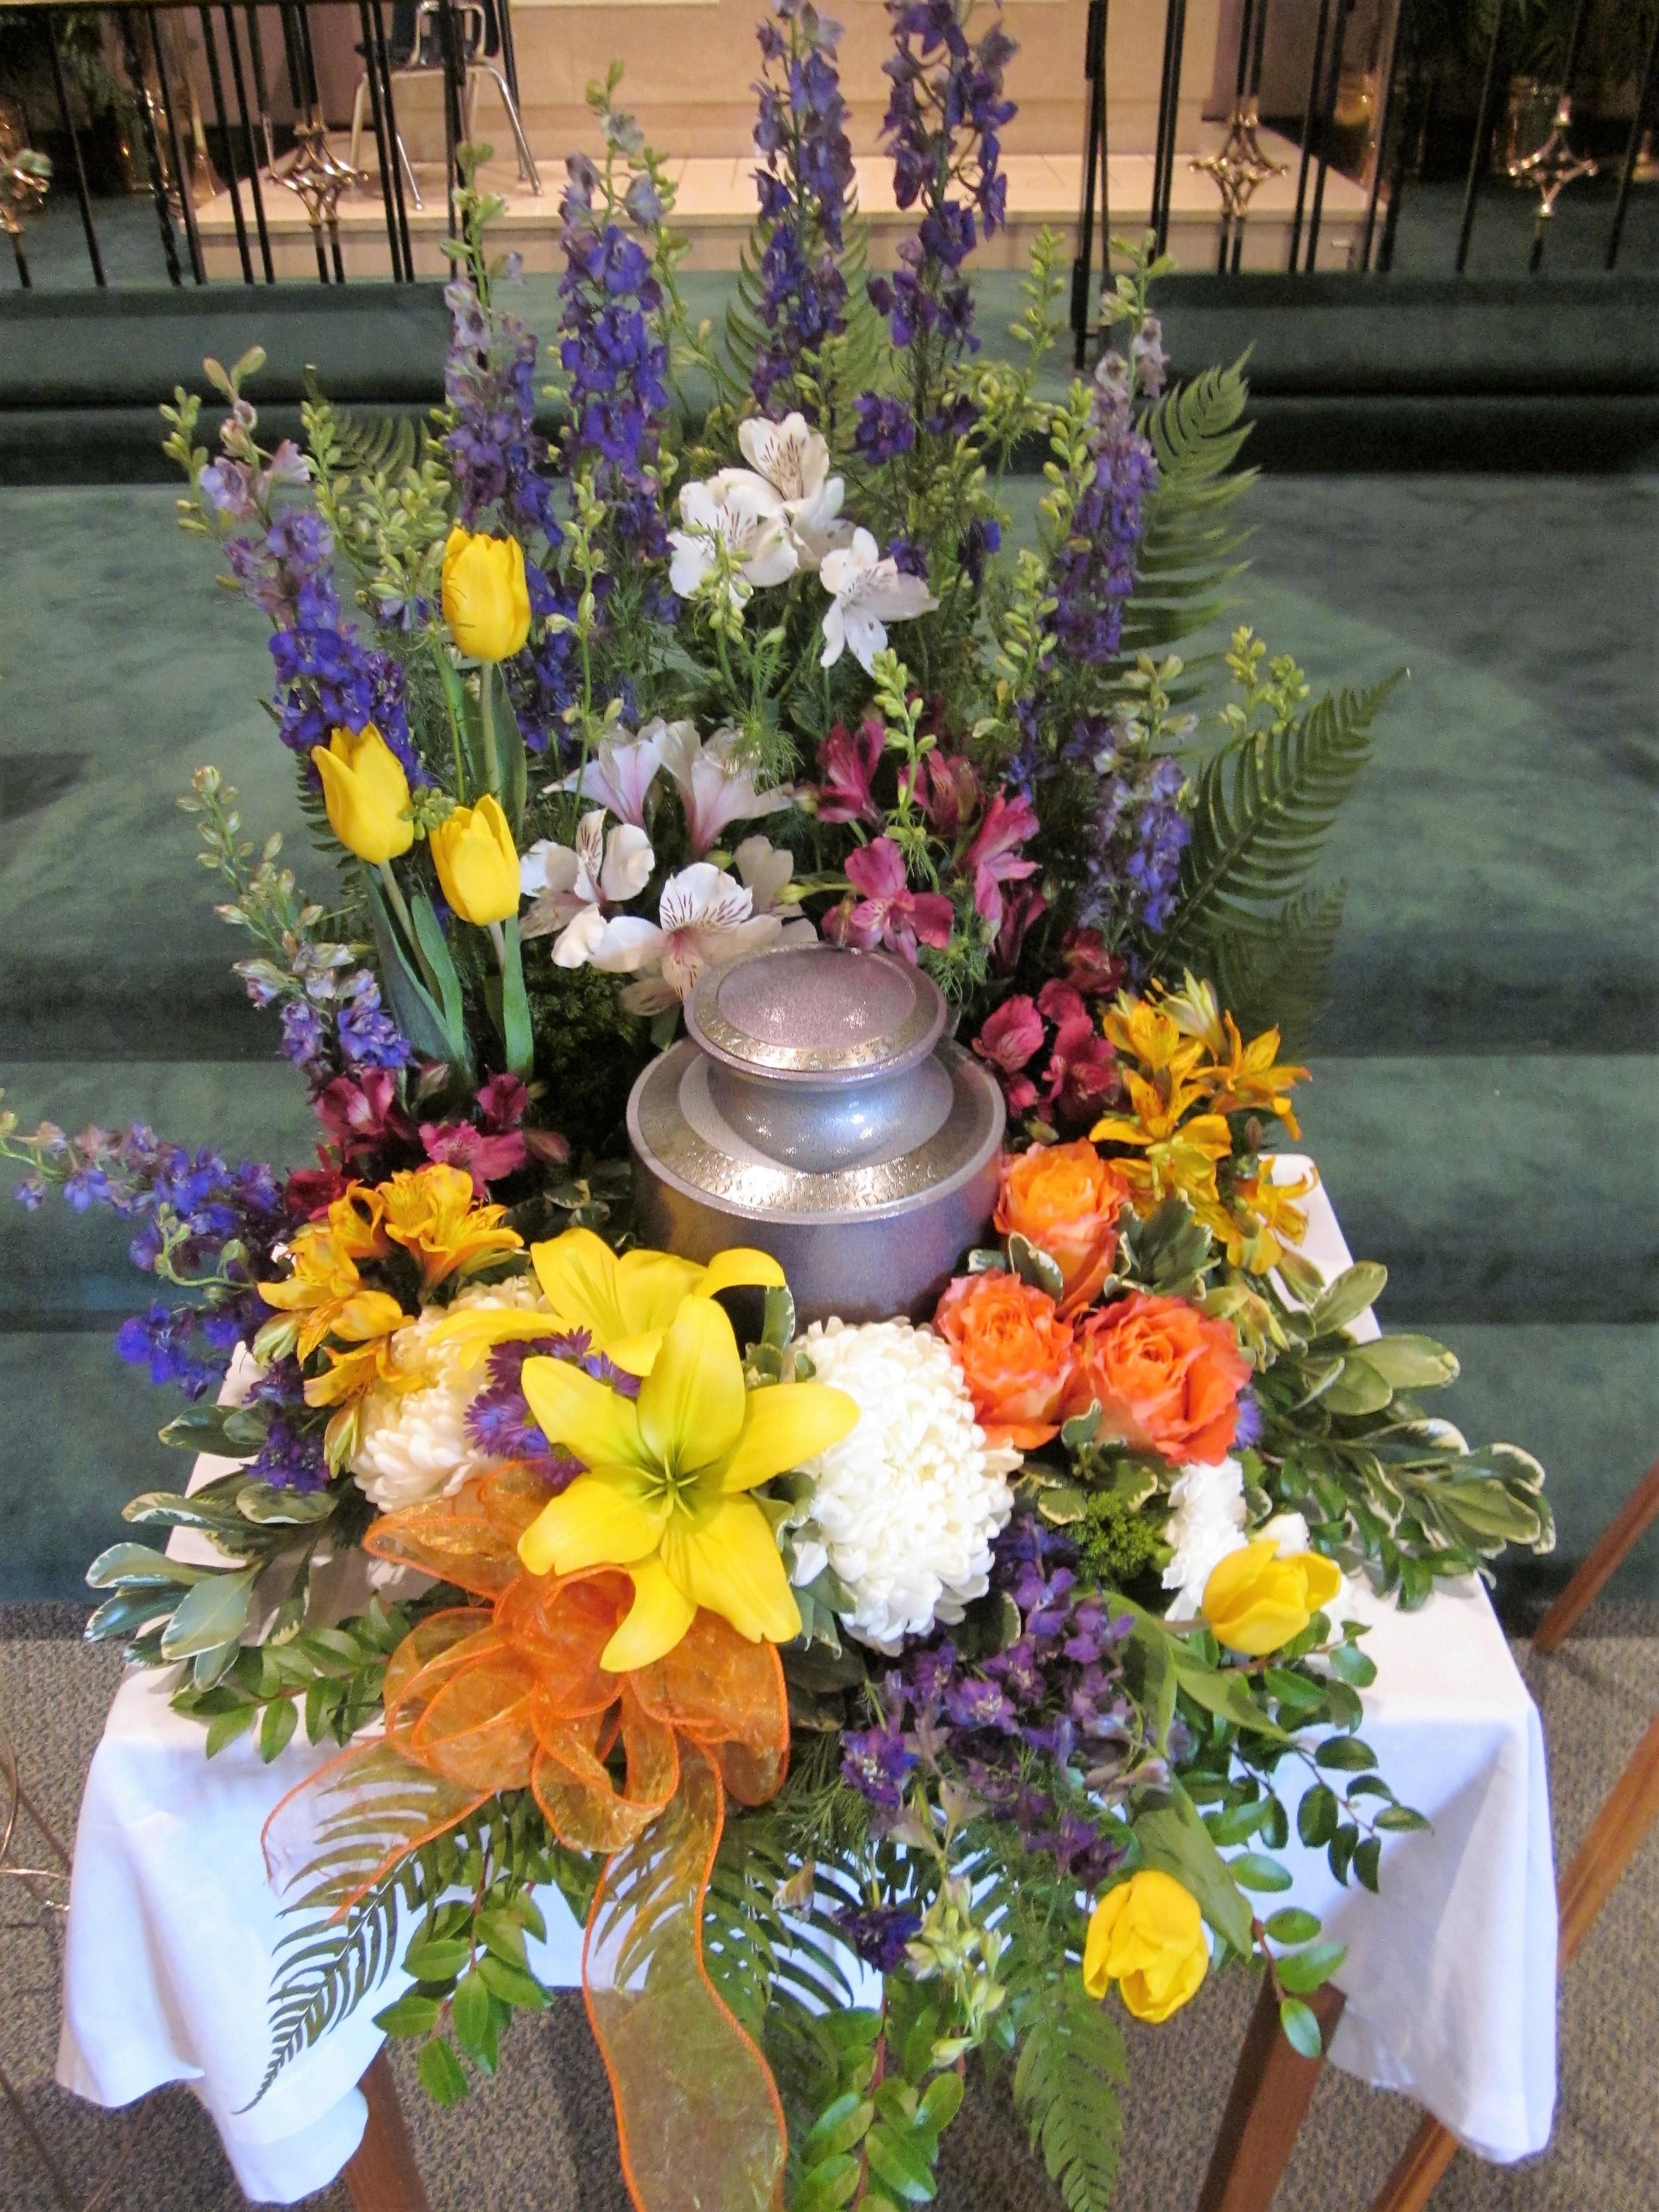 #14 Large multi colored bright urn surround